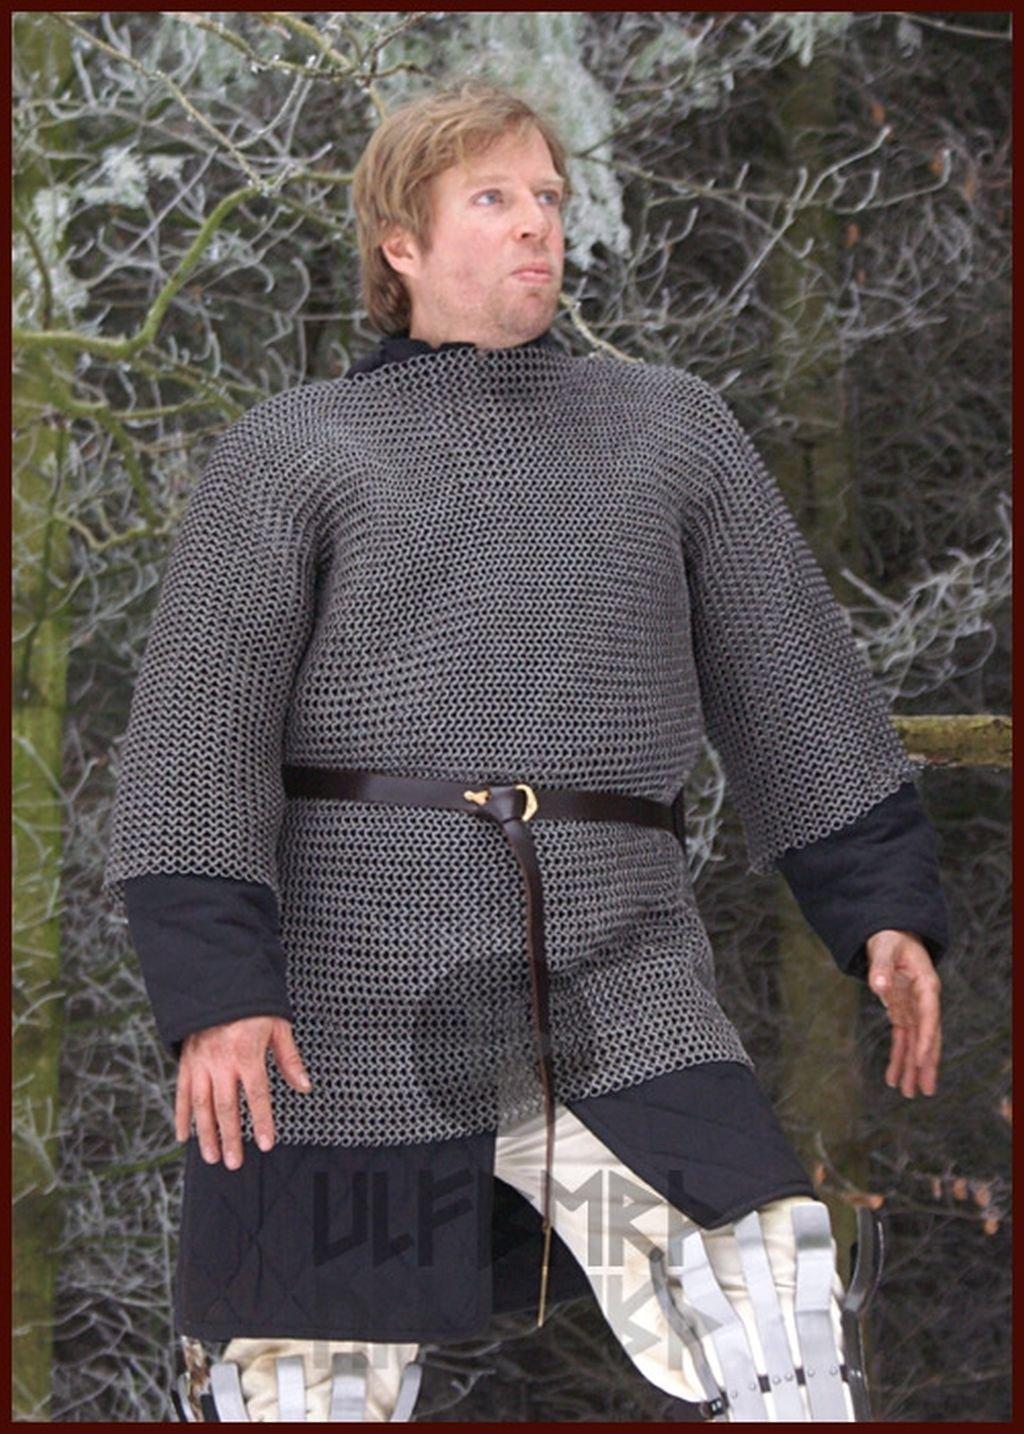 Mittelalter Kettenhemd Haubergeon, ID 8mm, Aluminium vernietet LARP Gr. XXL